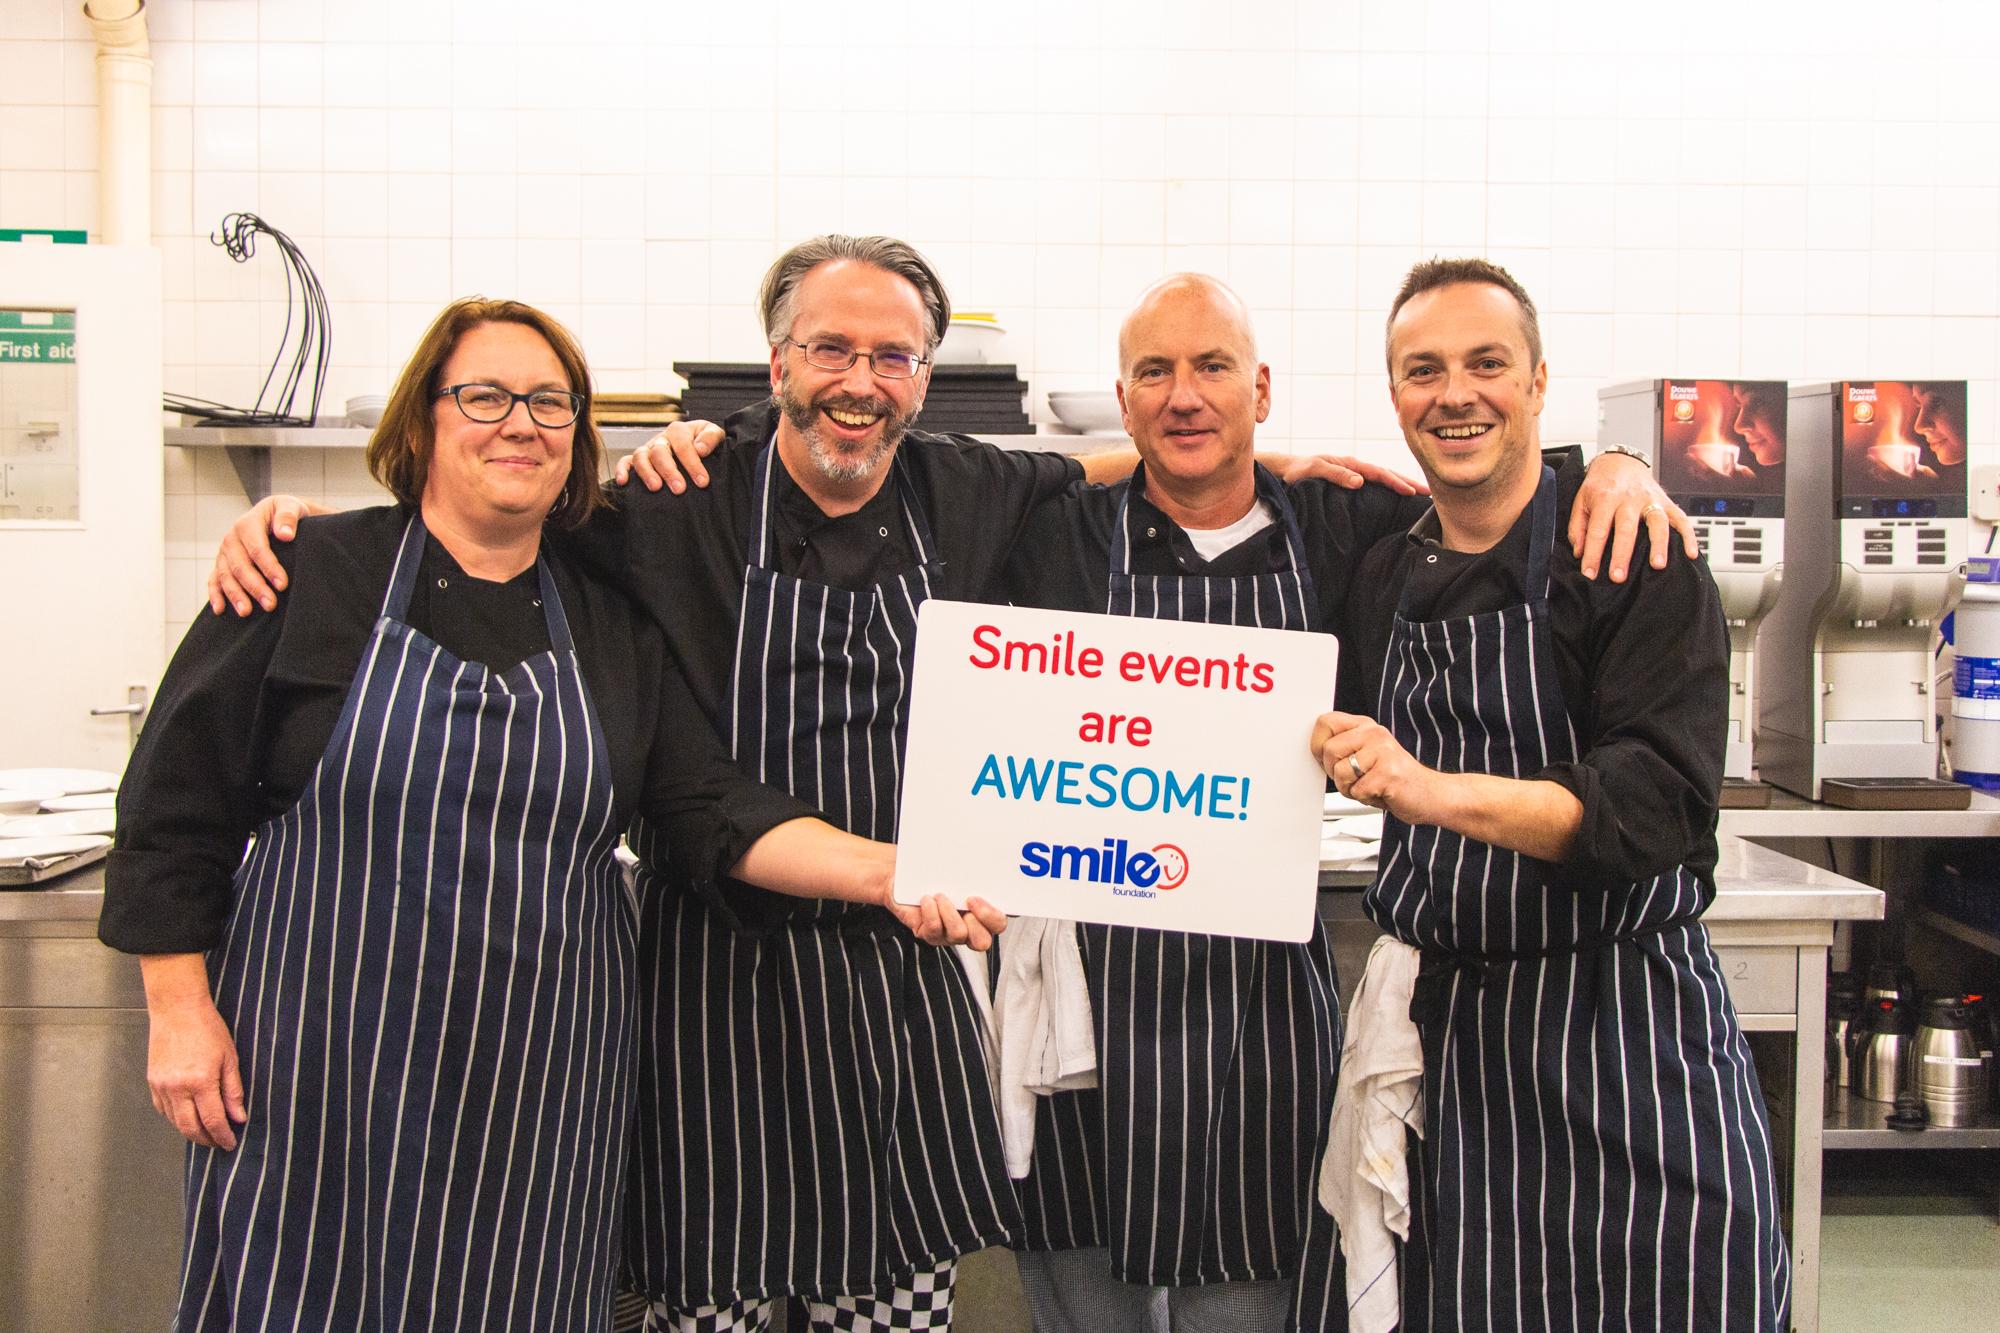 HSBC's Kitchen Team